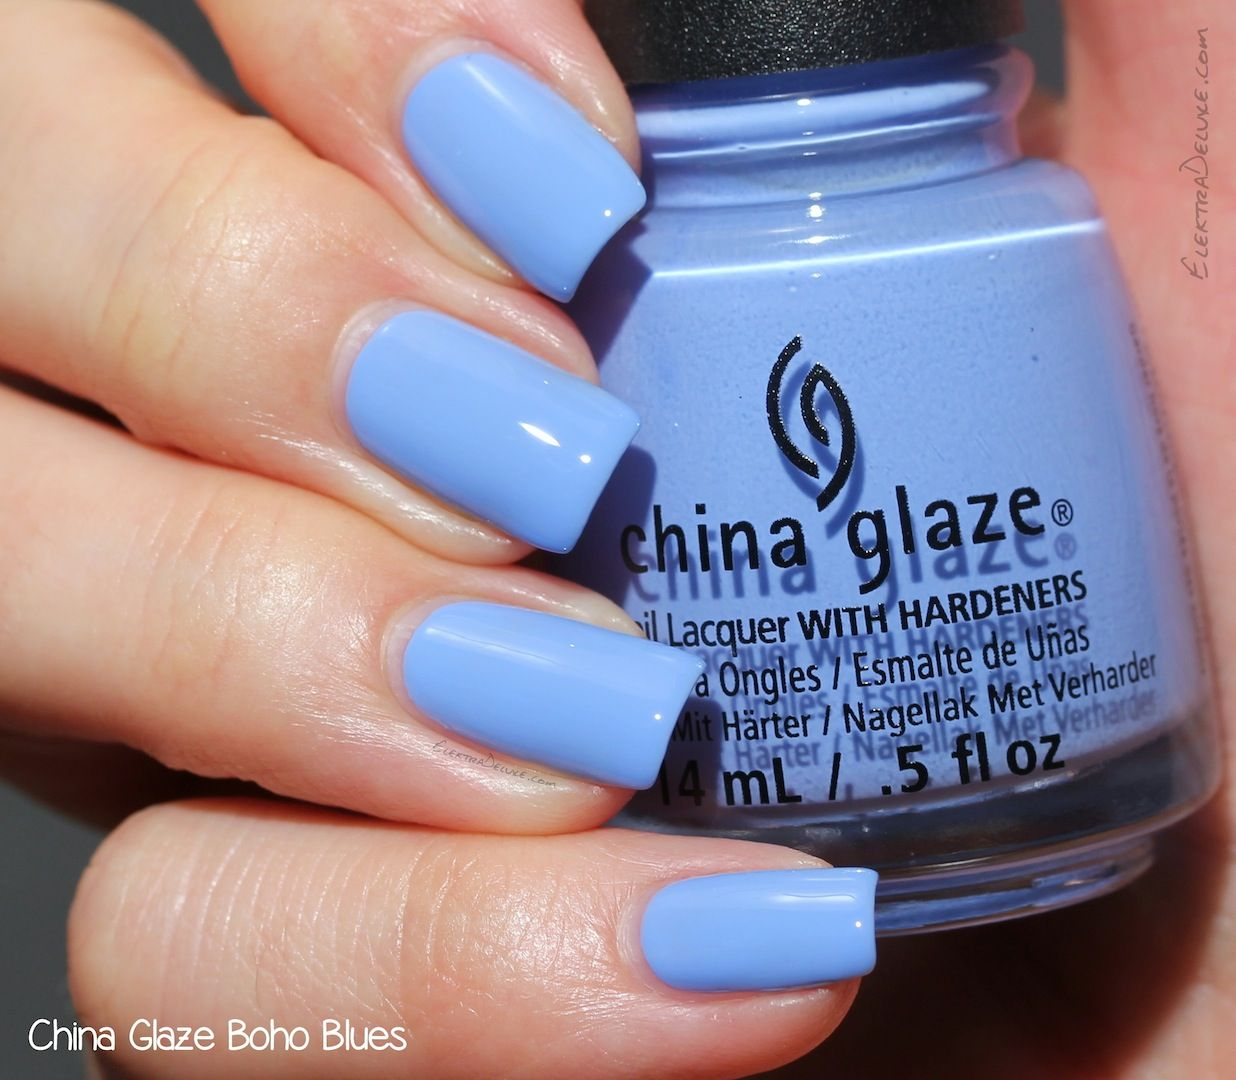 China Glaze Boho Blues, Road Trip Collection Spring 2015